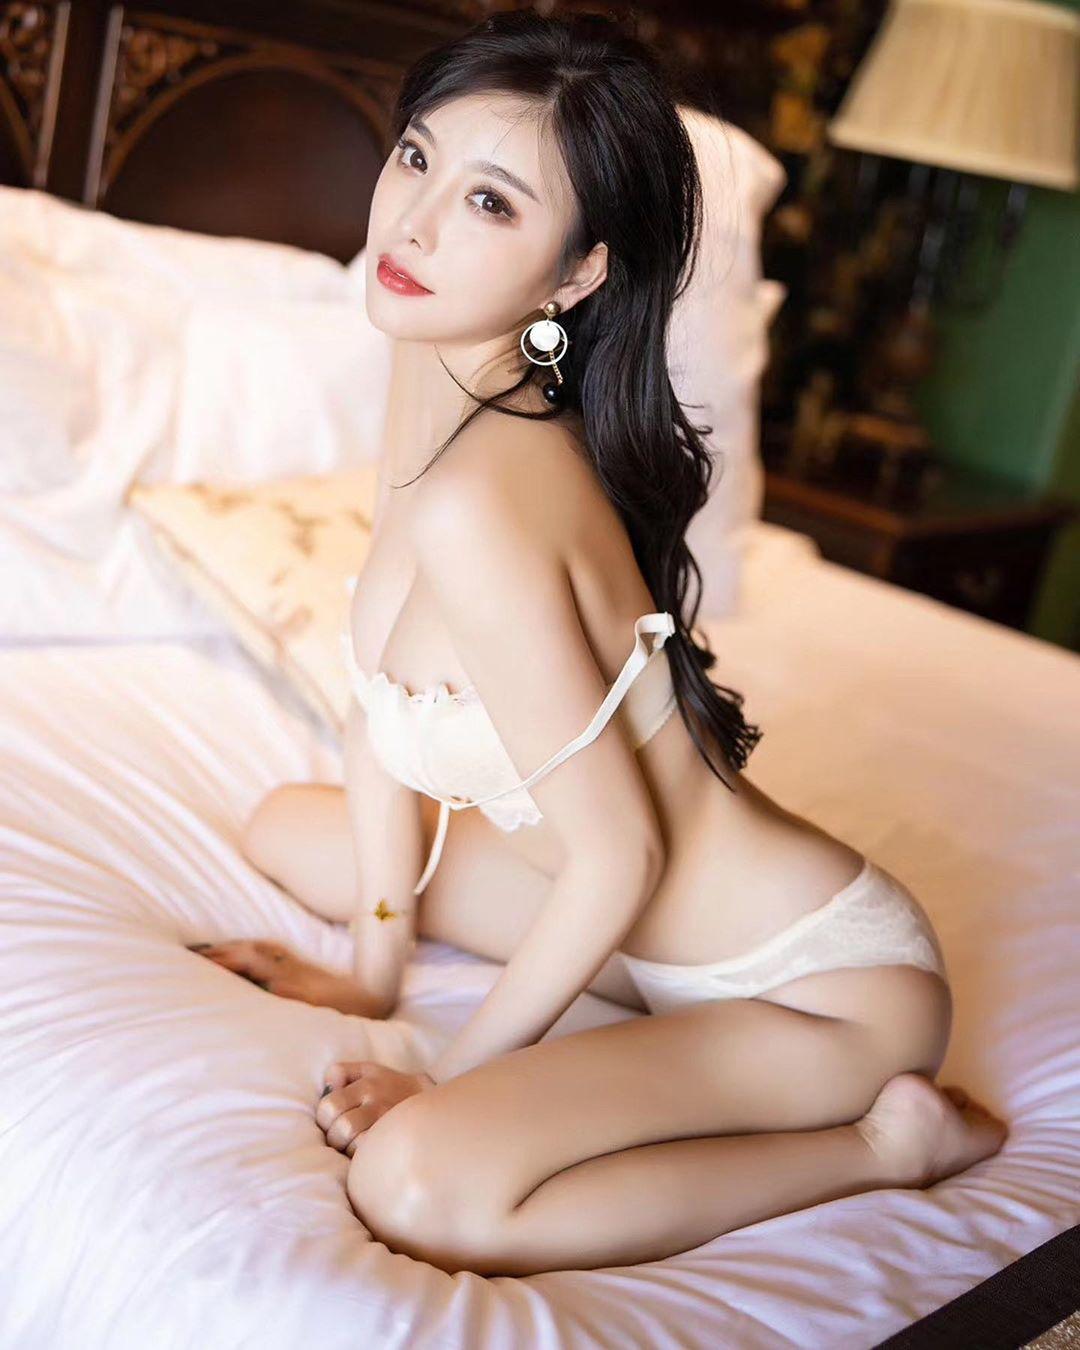 Xjp485wz o - IG正妹—楊晨晨 (2)